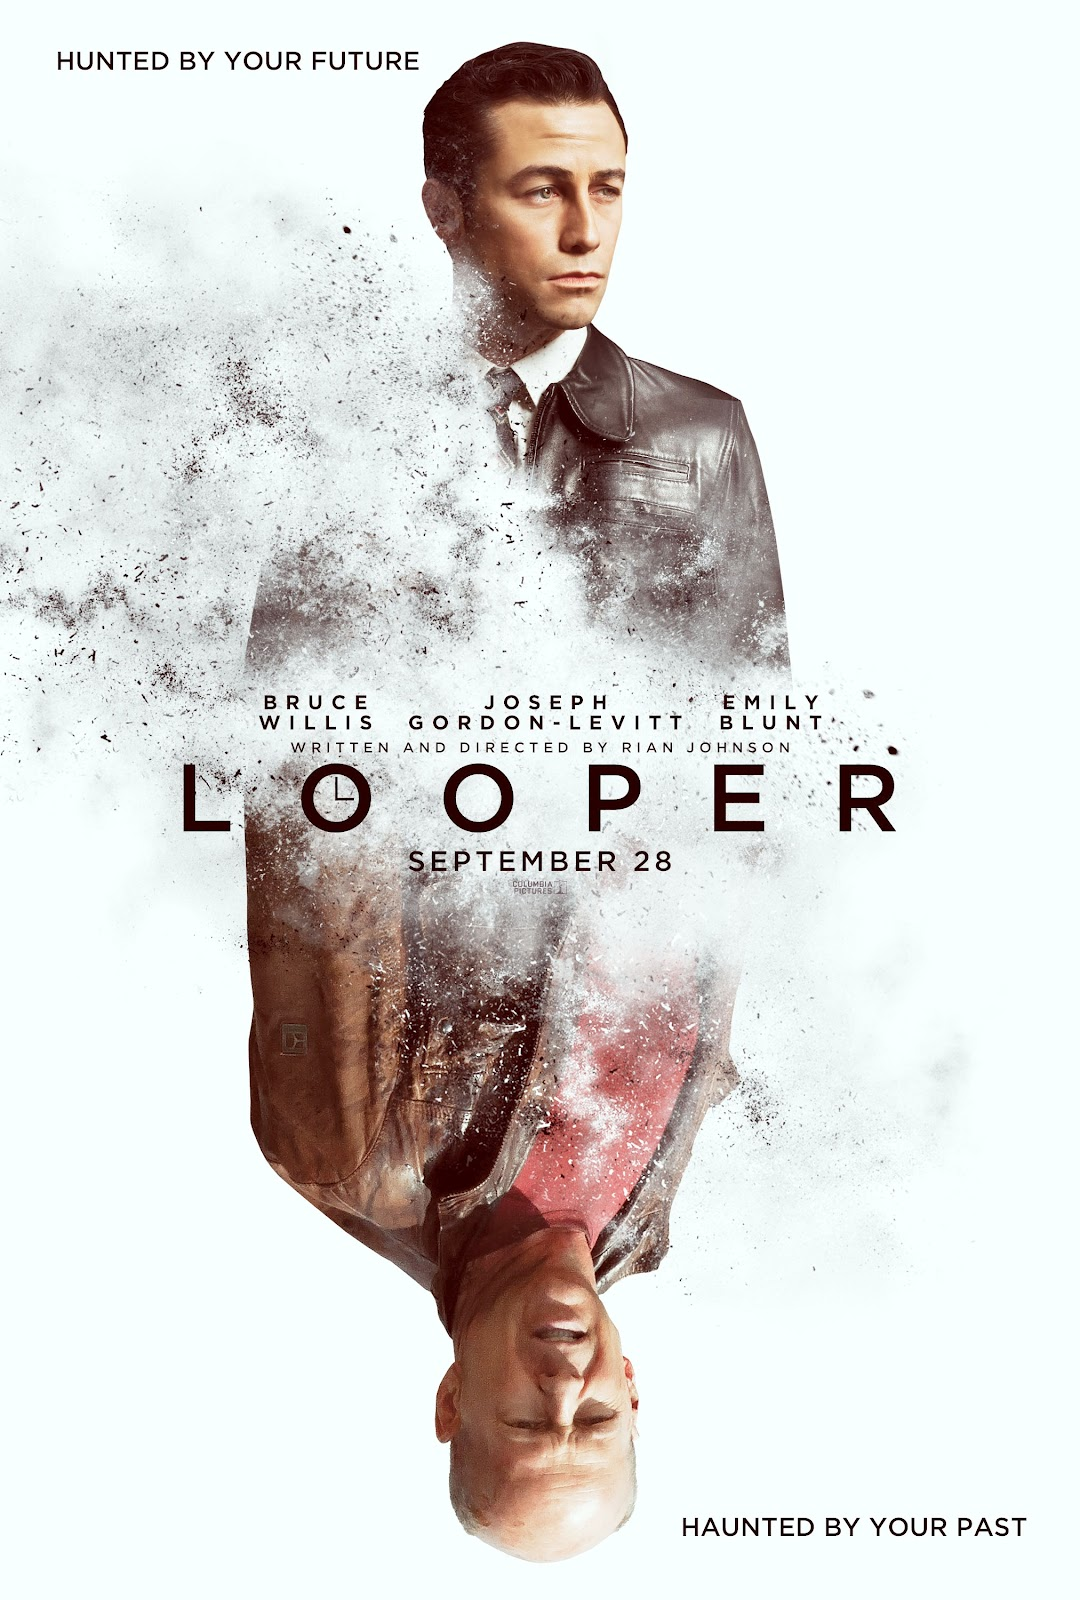 http://3.bp.blogspot.com/-Q_QeT3Tb0f0/UGWeO9aF86I/AAAAAAAAAe0/9ByCAfb00jY/s1600/looper-poster.jpg